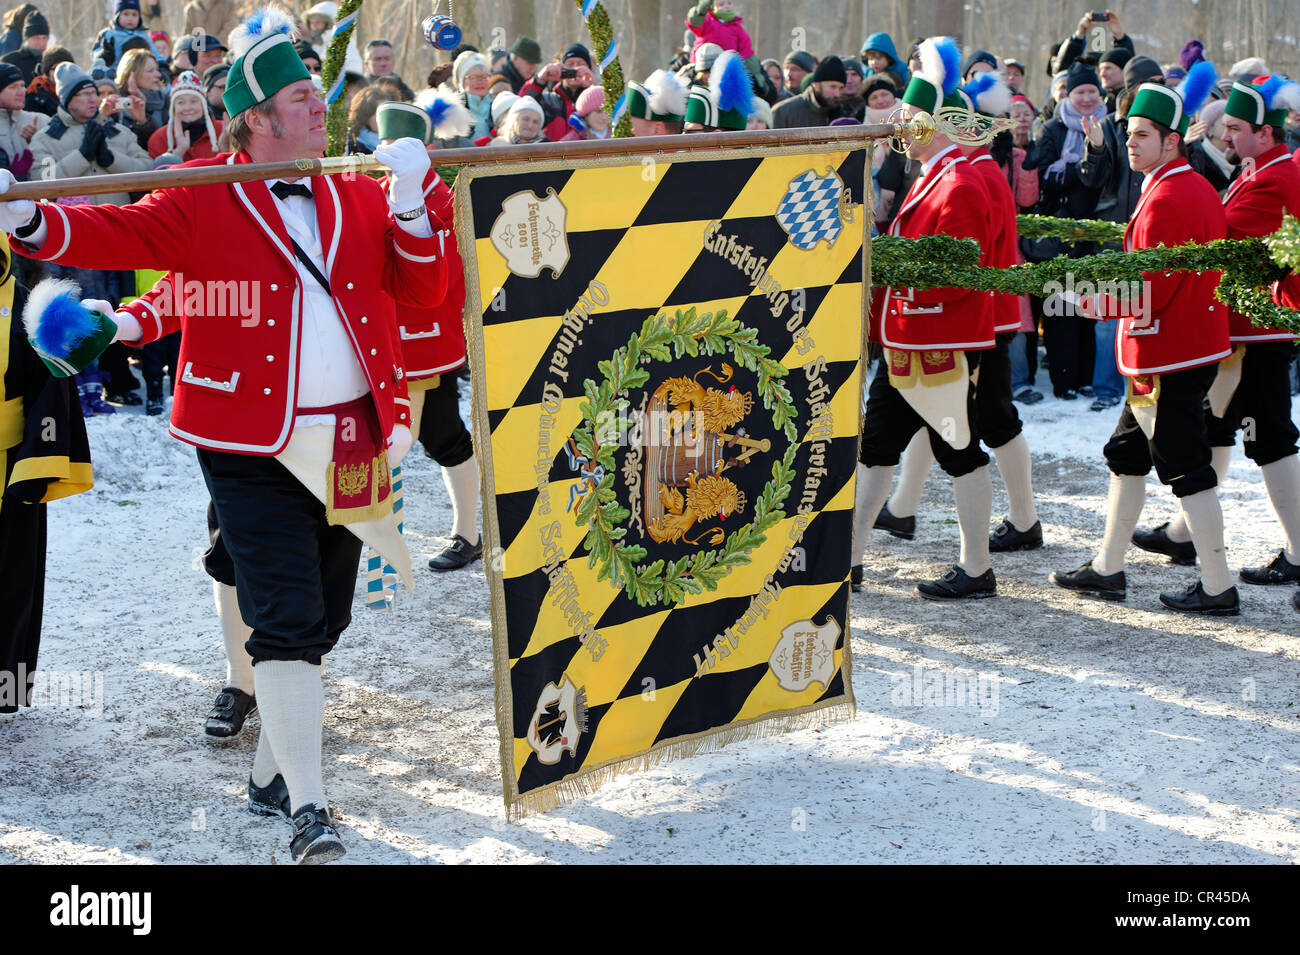 Schaefflertanz, traditional dance of the coopers, Flaucher area, Munich, Upper Bavaria, Germany, Europe - Stock Image